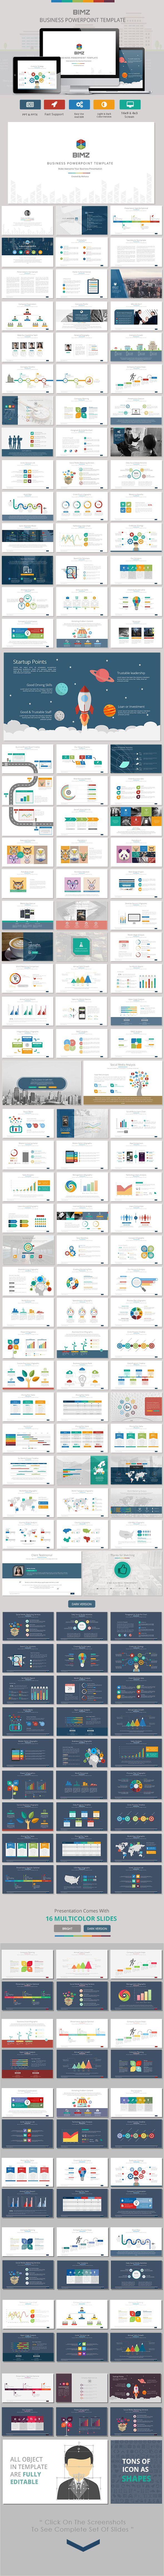 Bimz - Business Powerpoint Template #presentation Download: http://graphicriver.net/item/bimz-business-powerpoint-template/11254560?ref=ksioks